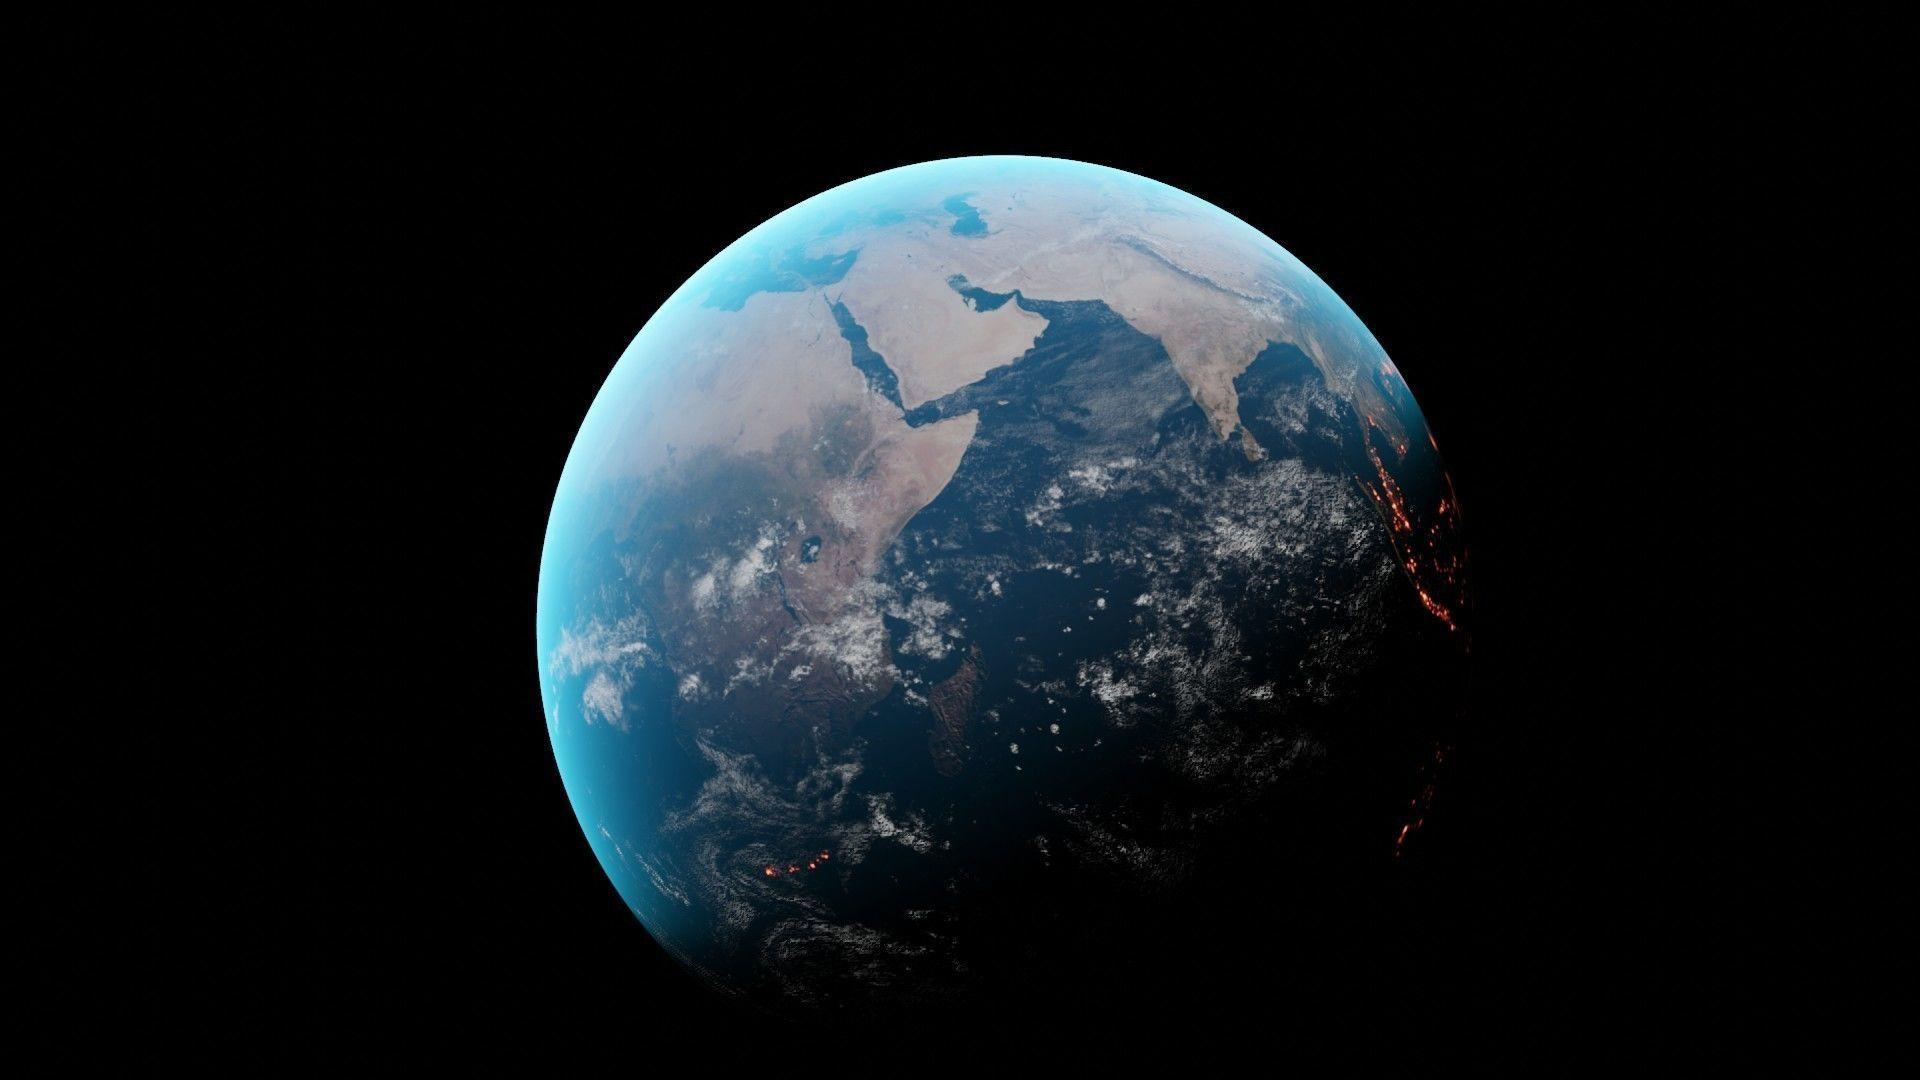 Earth photorealistic